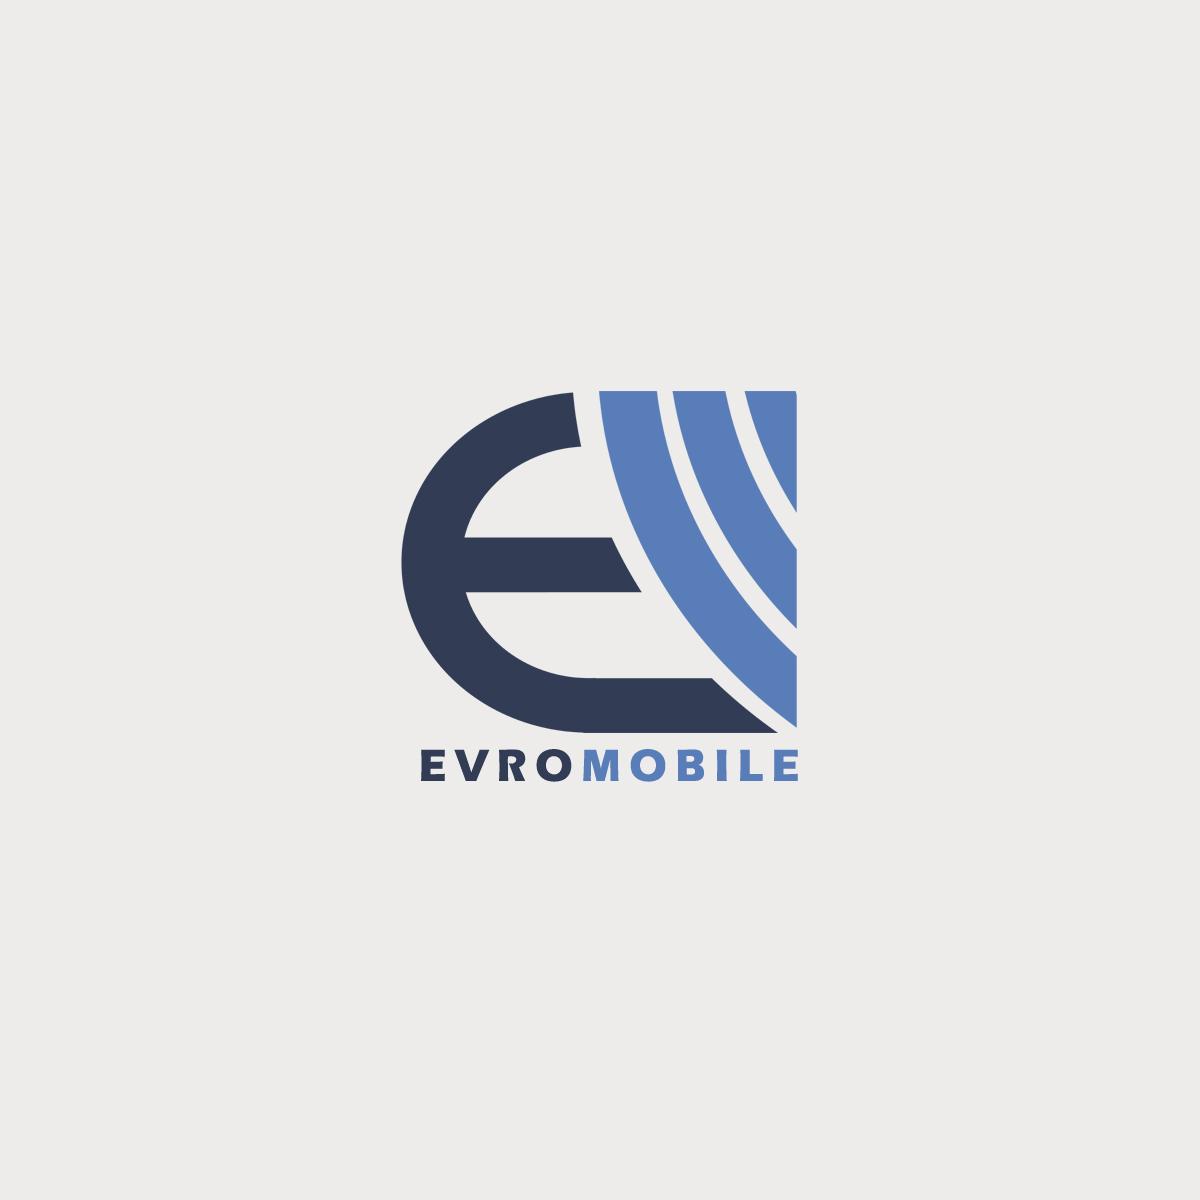 Редизайн логотипа фото f_26959ba6097a3063.jpg